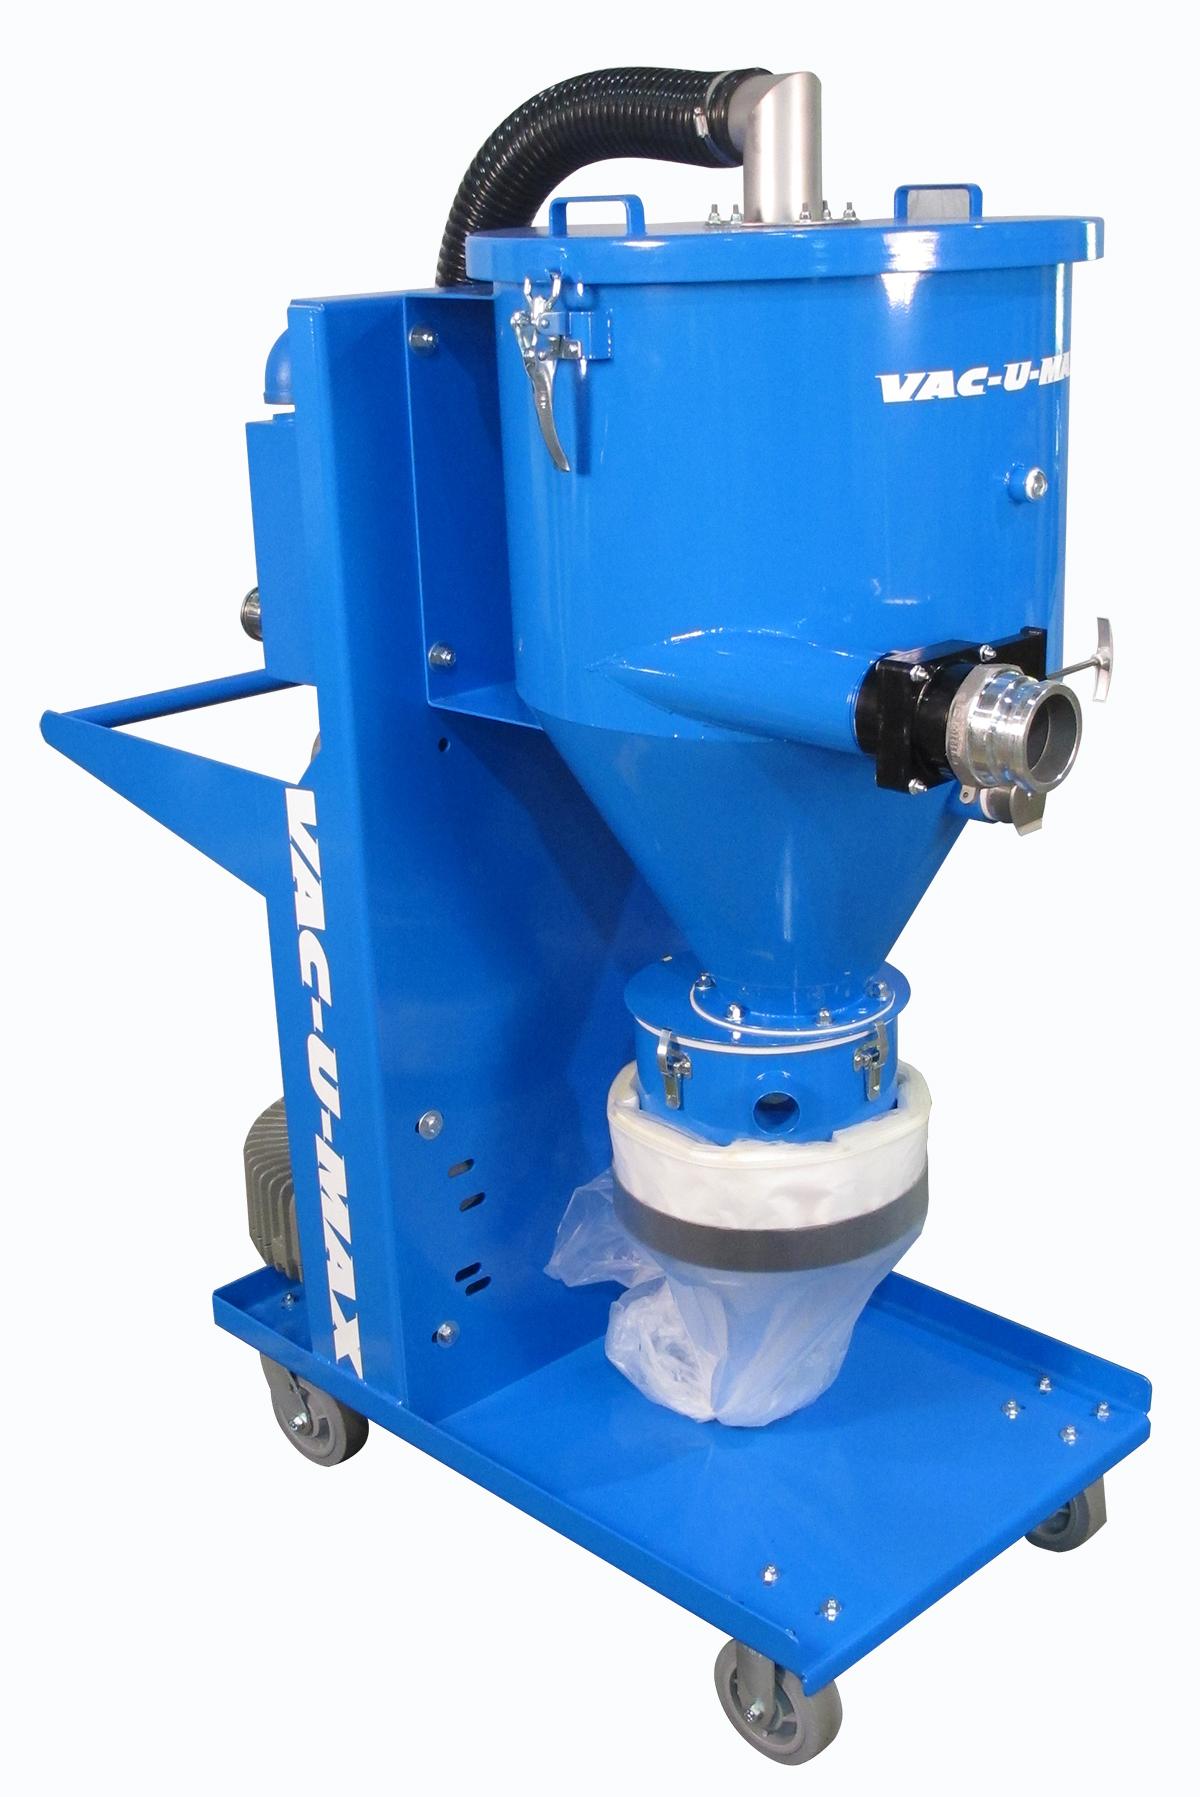 Vac U Max Vac U Max Industrial Vacuums Hepa Vacuums